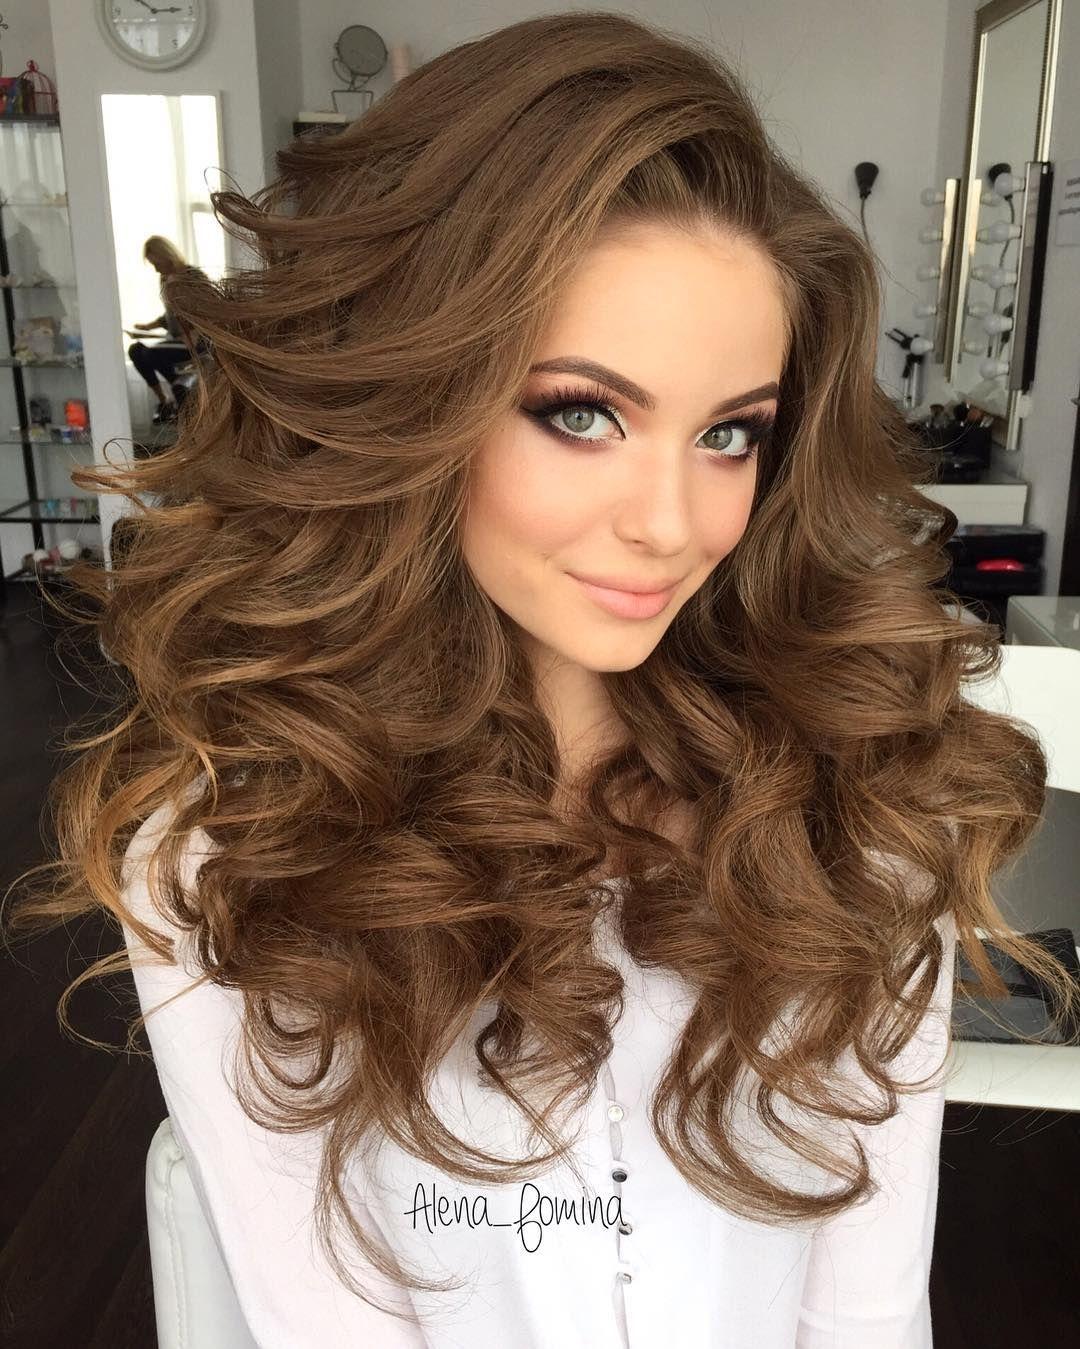 Big Wedding Hair: ☪Pinterest → FrenchFanGirl ☼...Beautiful Style Looking